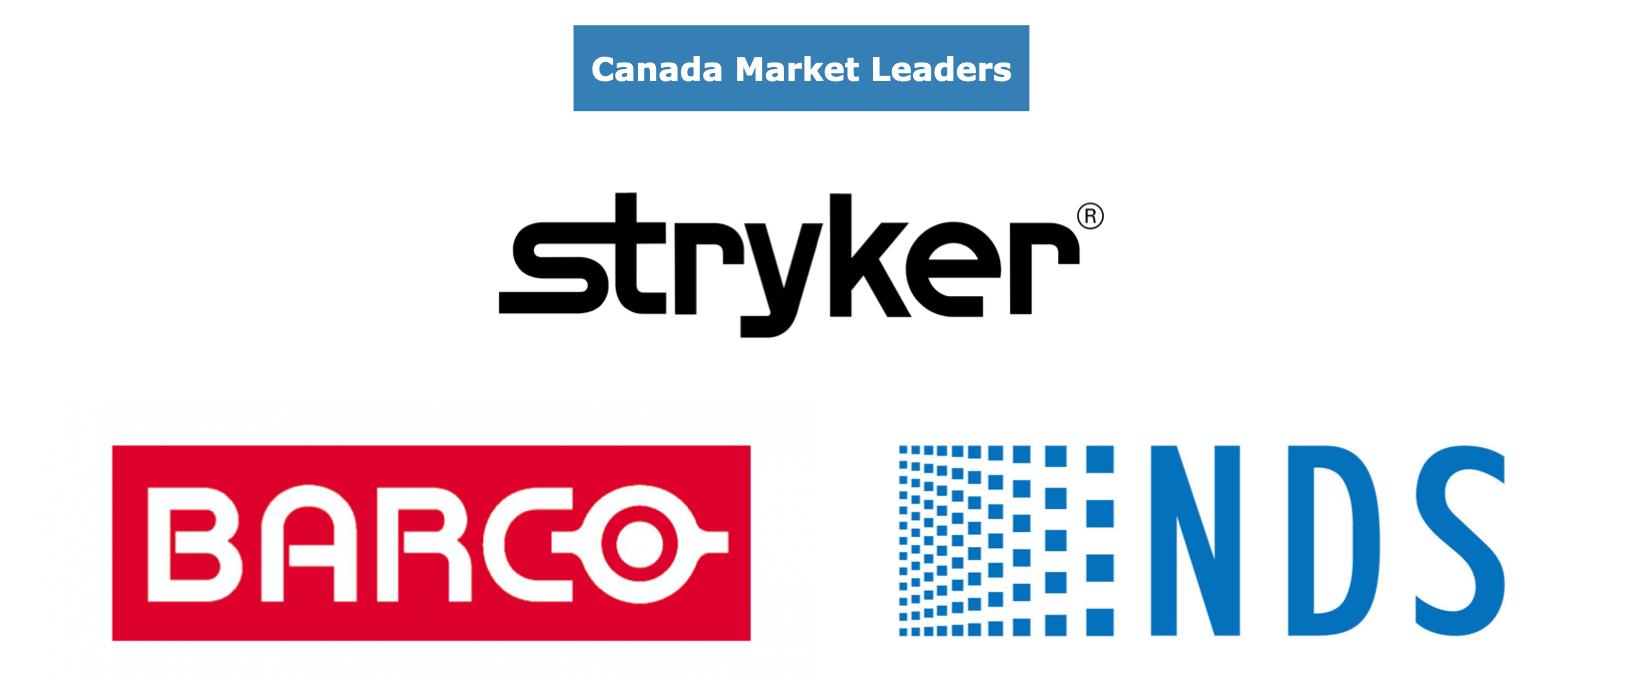 Canadian Video Endoscopy Market Share Leaders